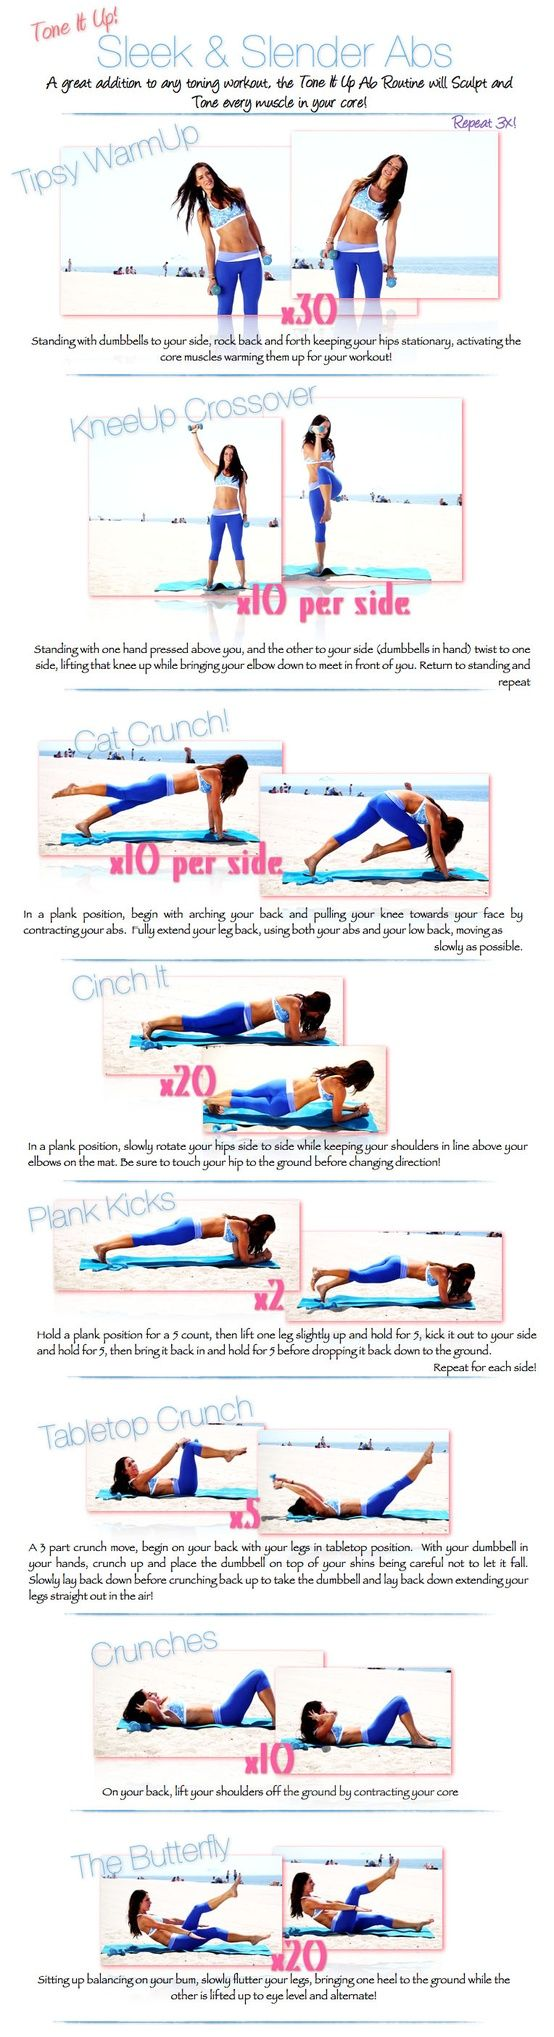 TIU slender abs workout